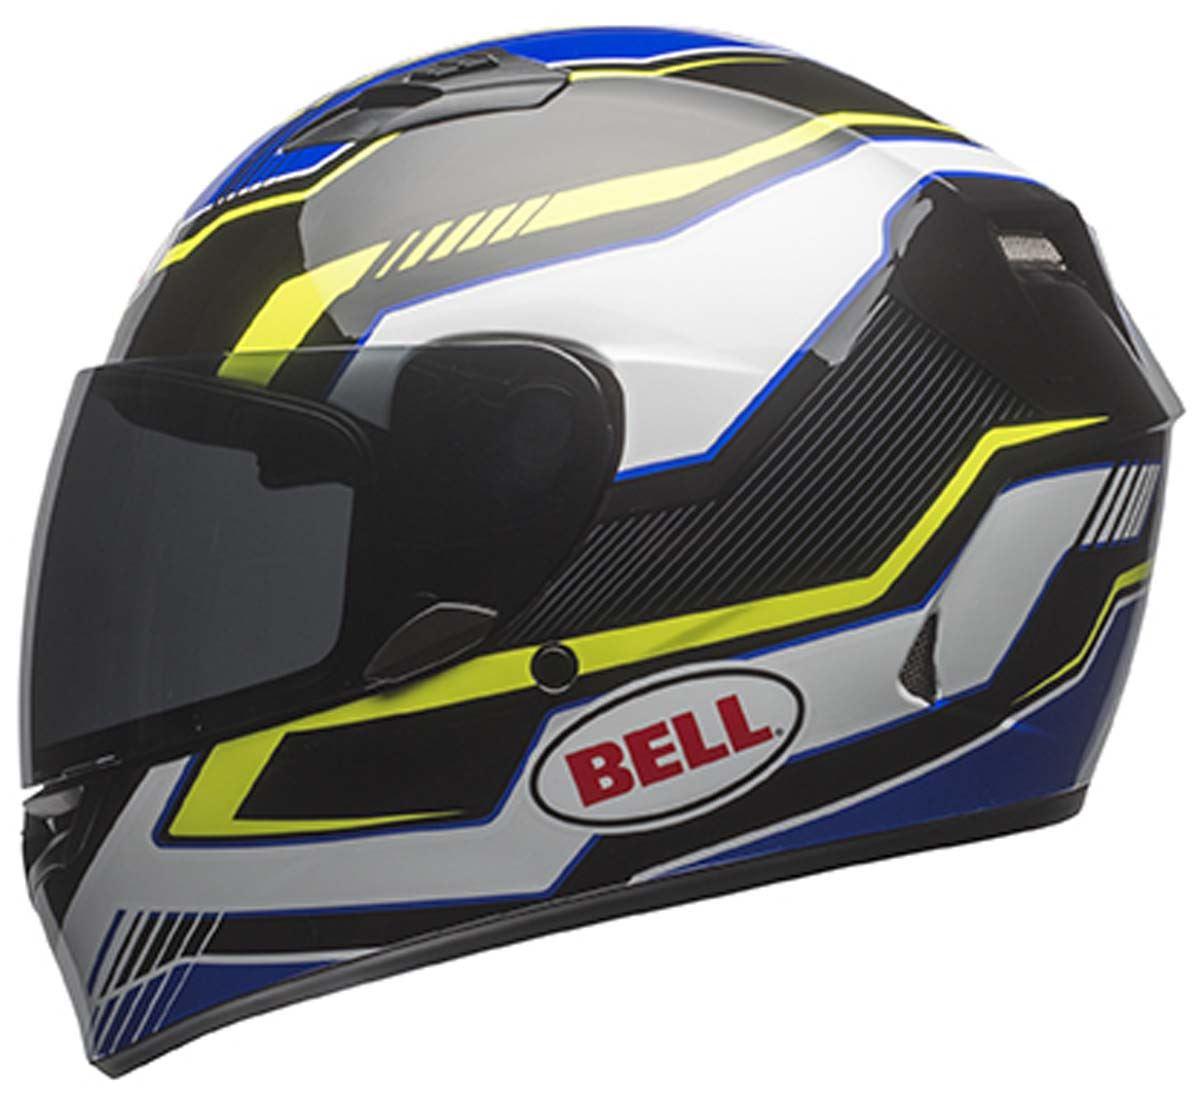 Bell-Qualifier-Helmet-Full-Face-Motorcycle-Clear-Shield-DOT-XS-3XL miniature 22